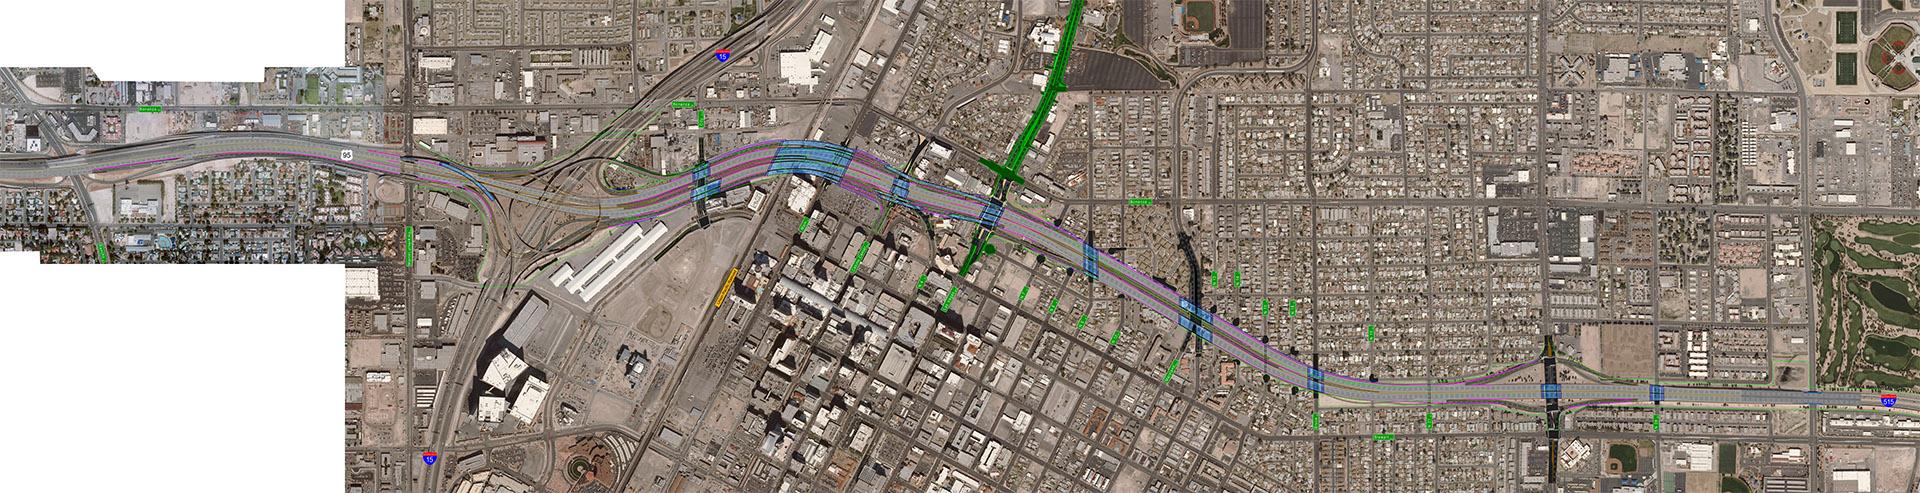 Aerial map of design for alternative 2